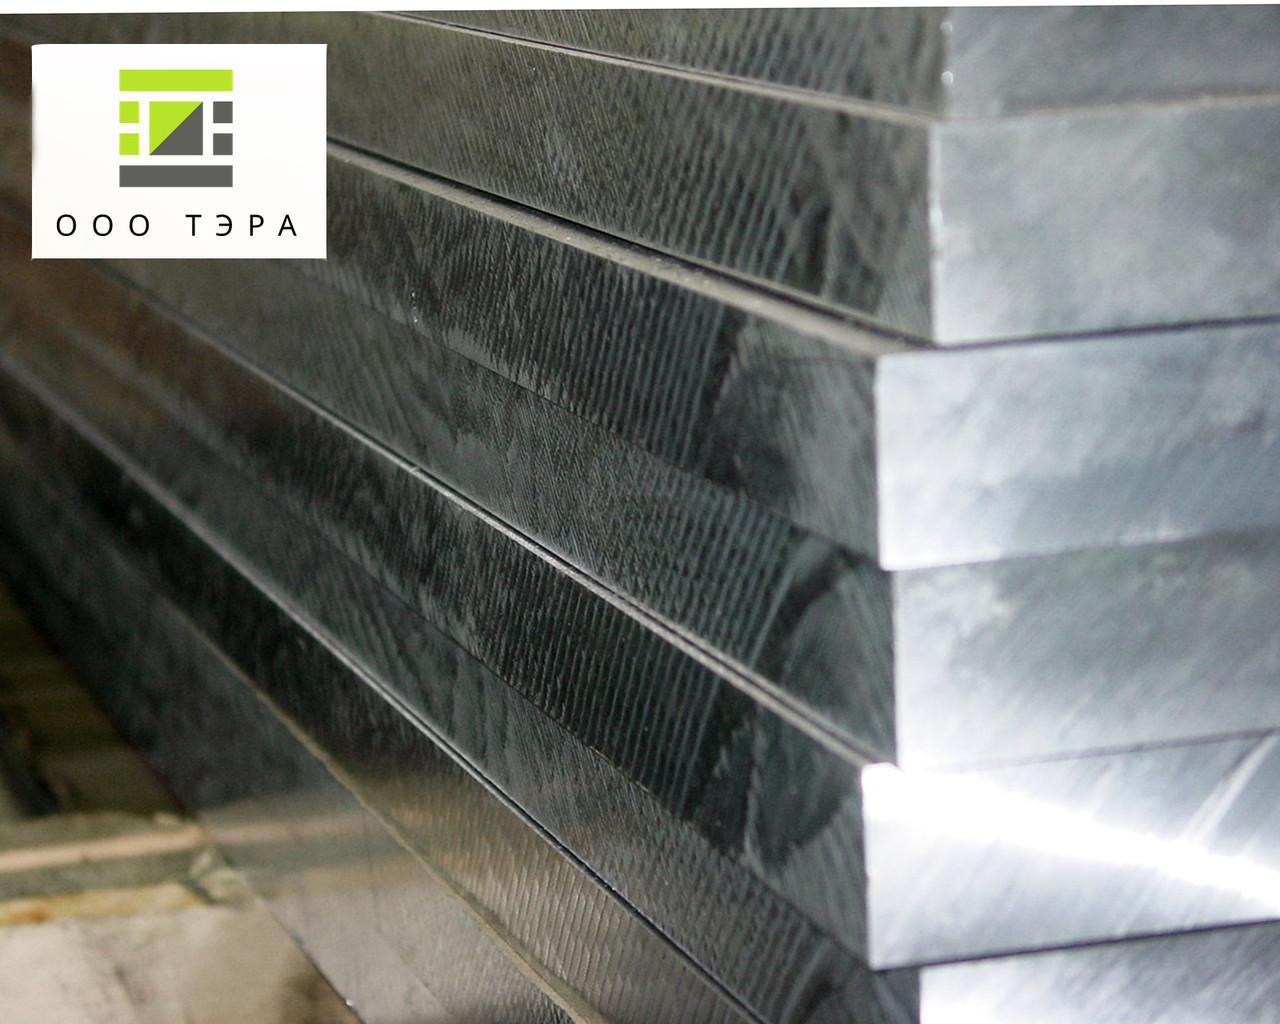 Дюралевая плита Д16 толщина 55 мм алюминиевая, аналог 2024